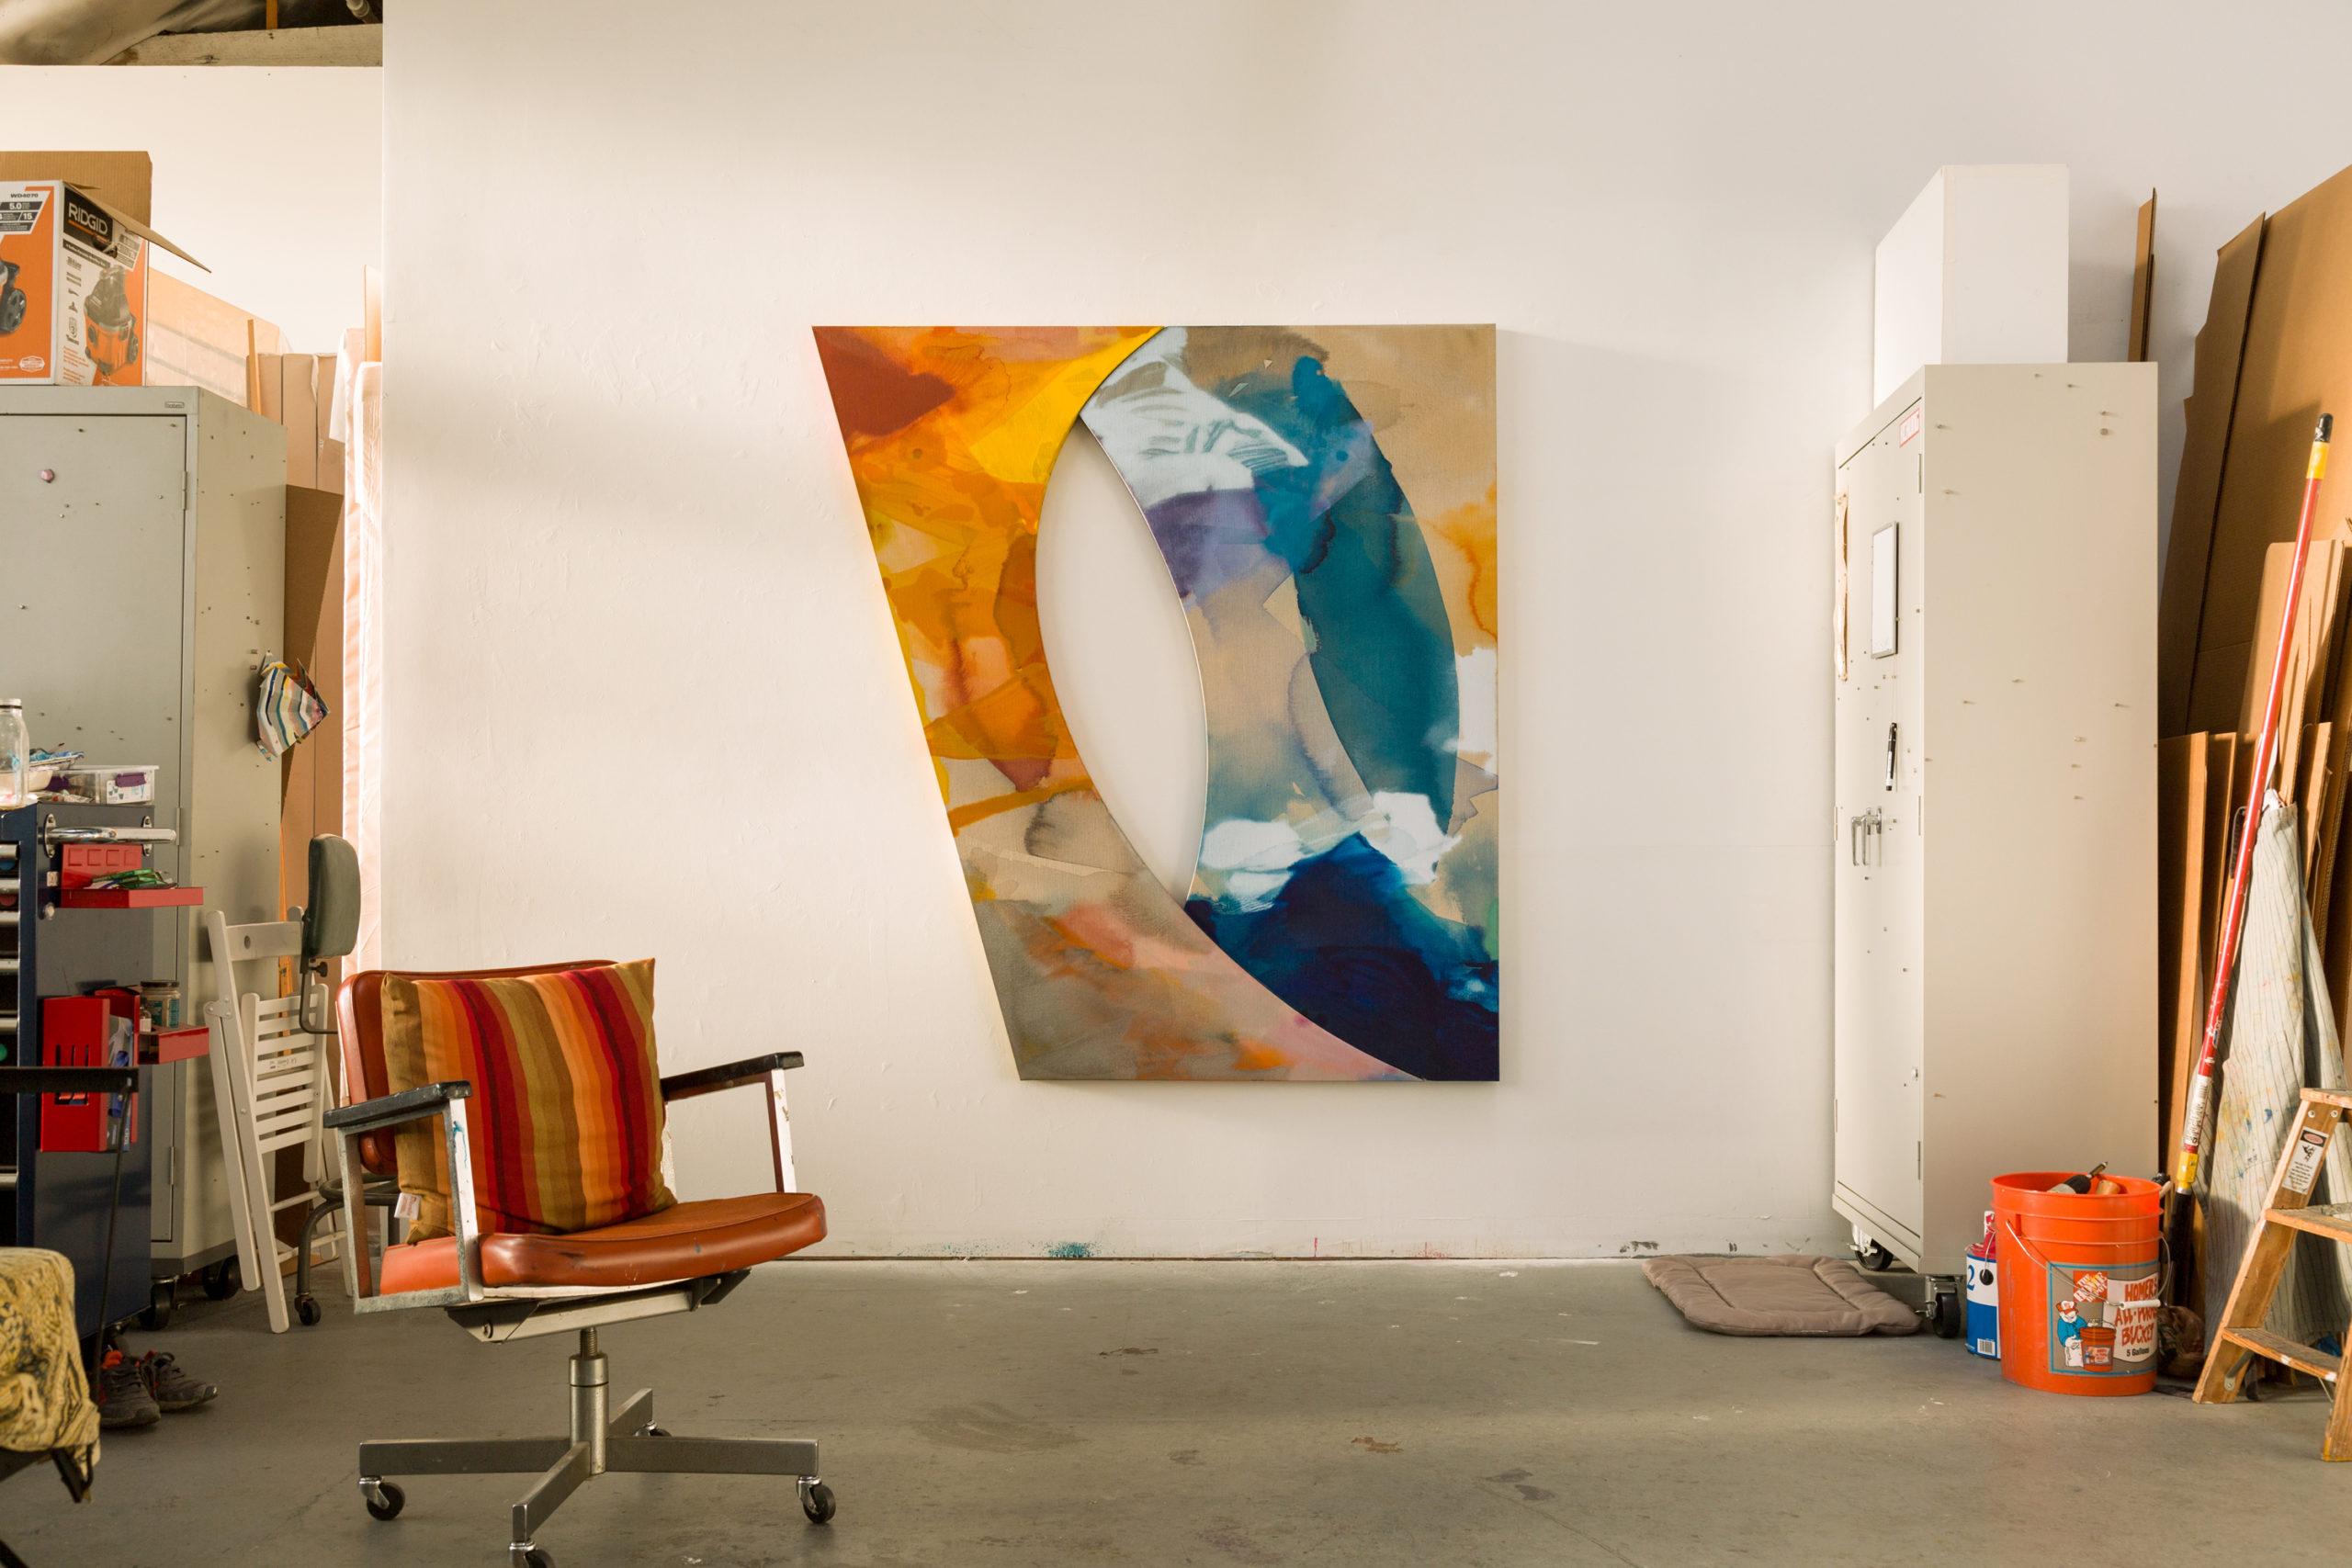 Pamela Jorden, studio installation of Eye, 2020 Acrylic and oil on linen, 72 × 65 3/8 inches (182.88 × 166.05 cm)